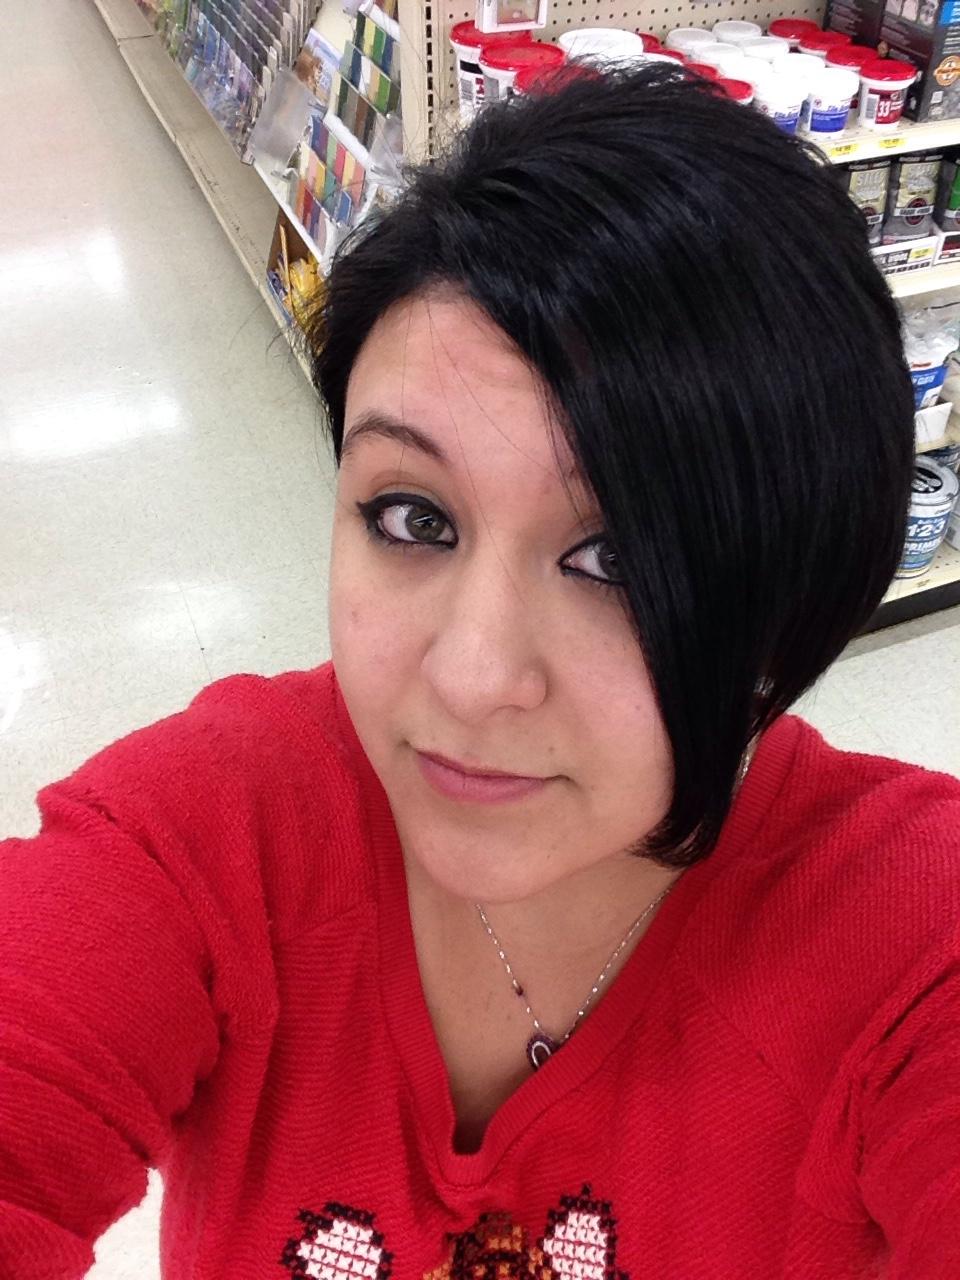 babe short hair selfie short hair selfie by nacofthestoneage on deviantart